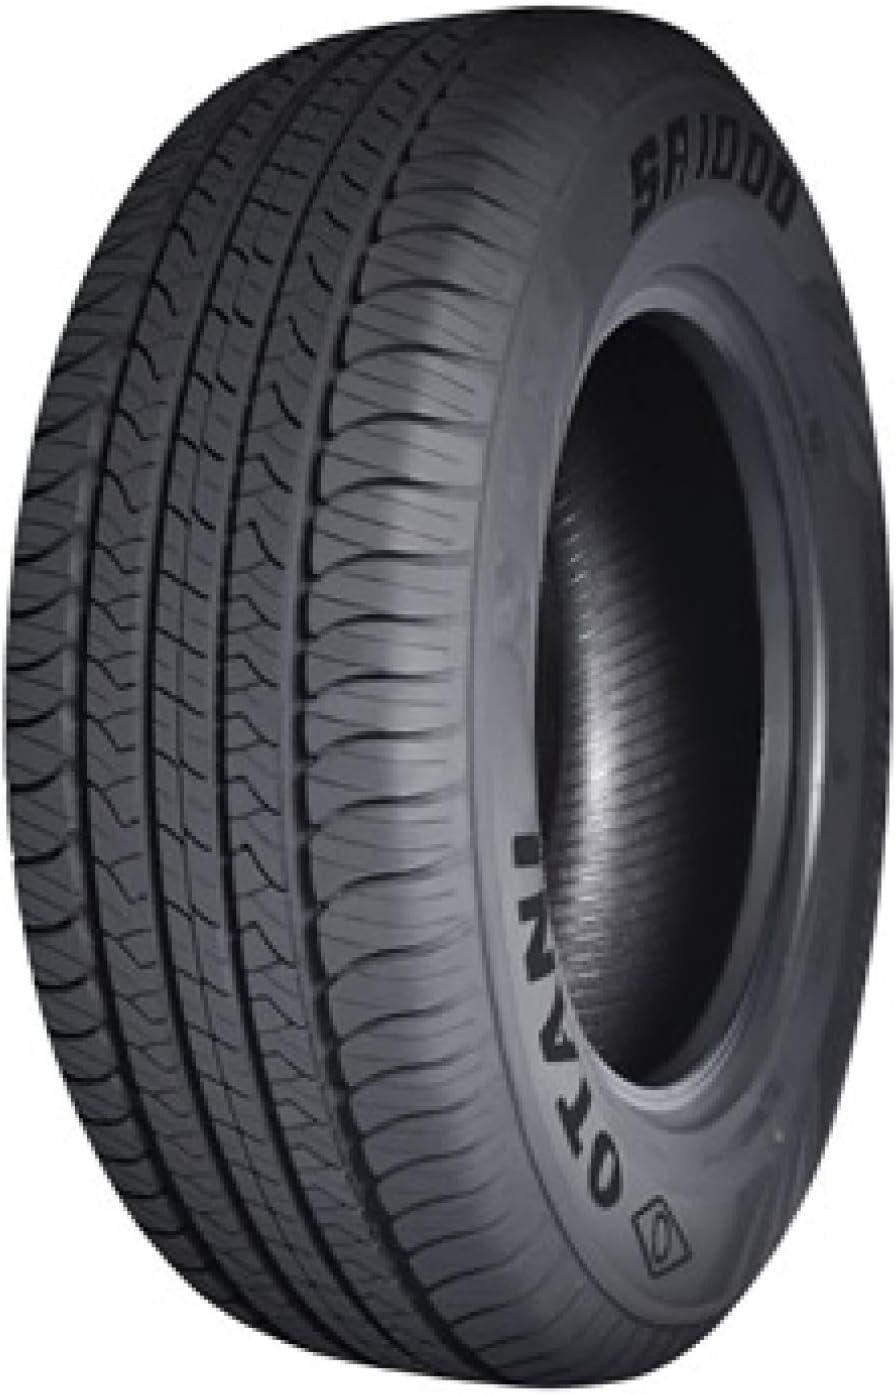 265//70R17 115H Otani SA1000 All-Season Radial Tire